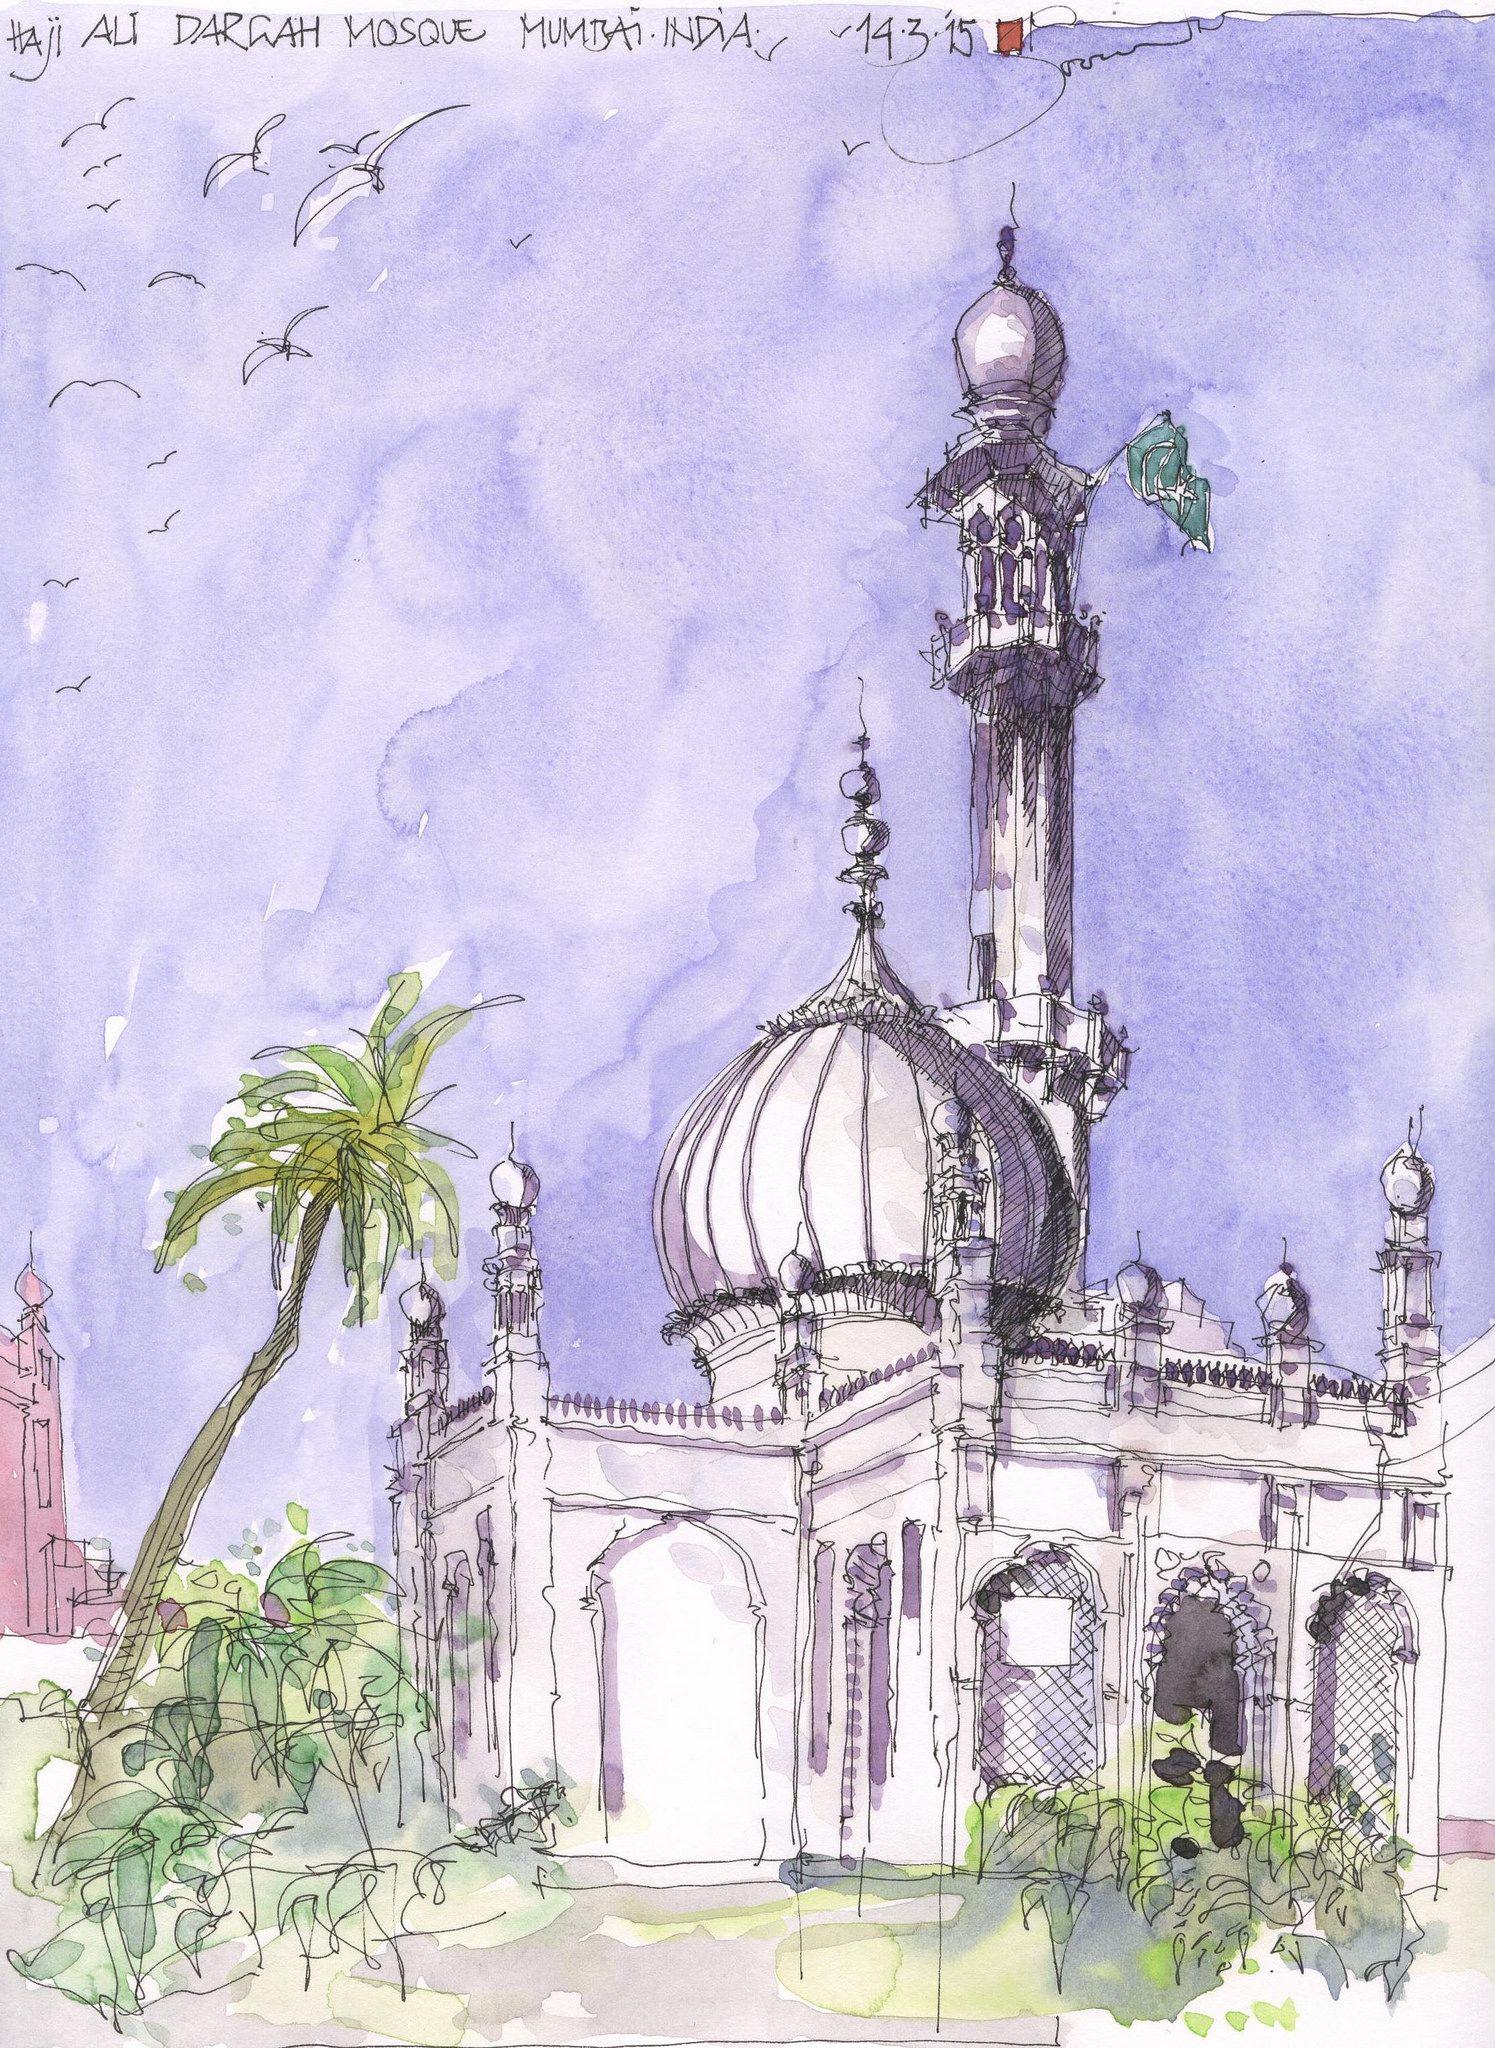 Haji Ali Dargah Moschee, Mumbai, INDIA | Art - Sketching | Pinterest